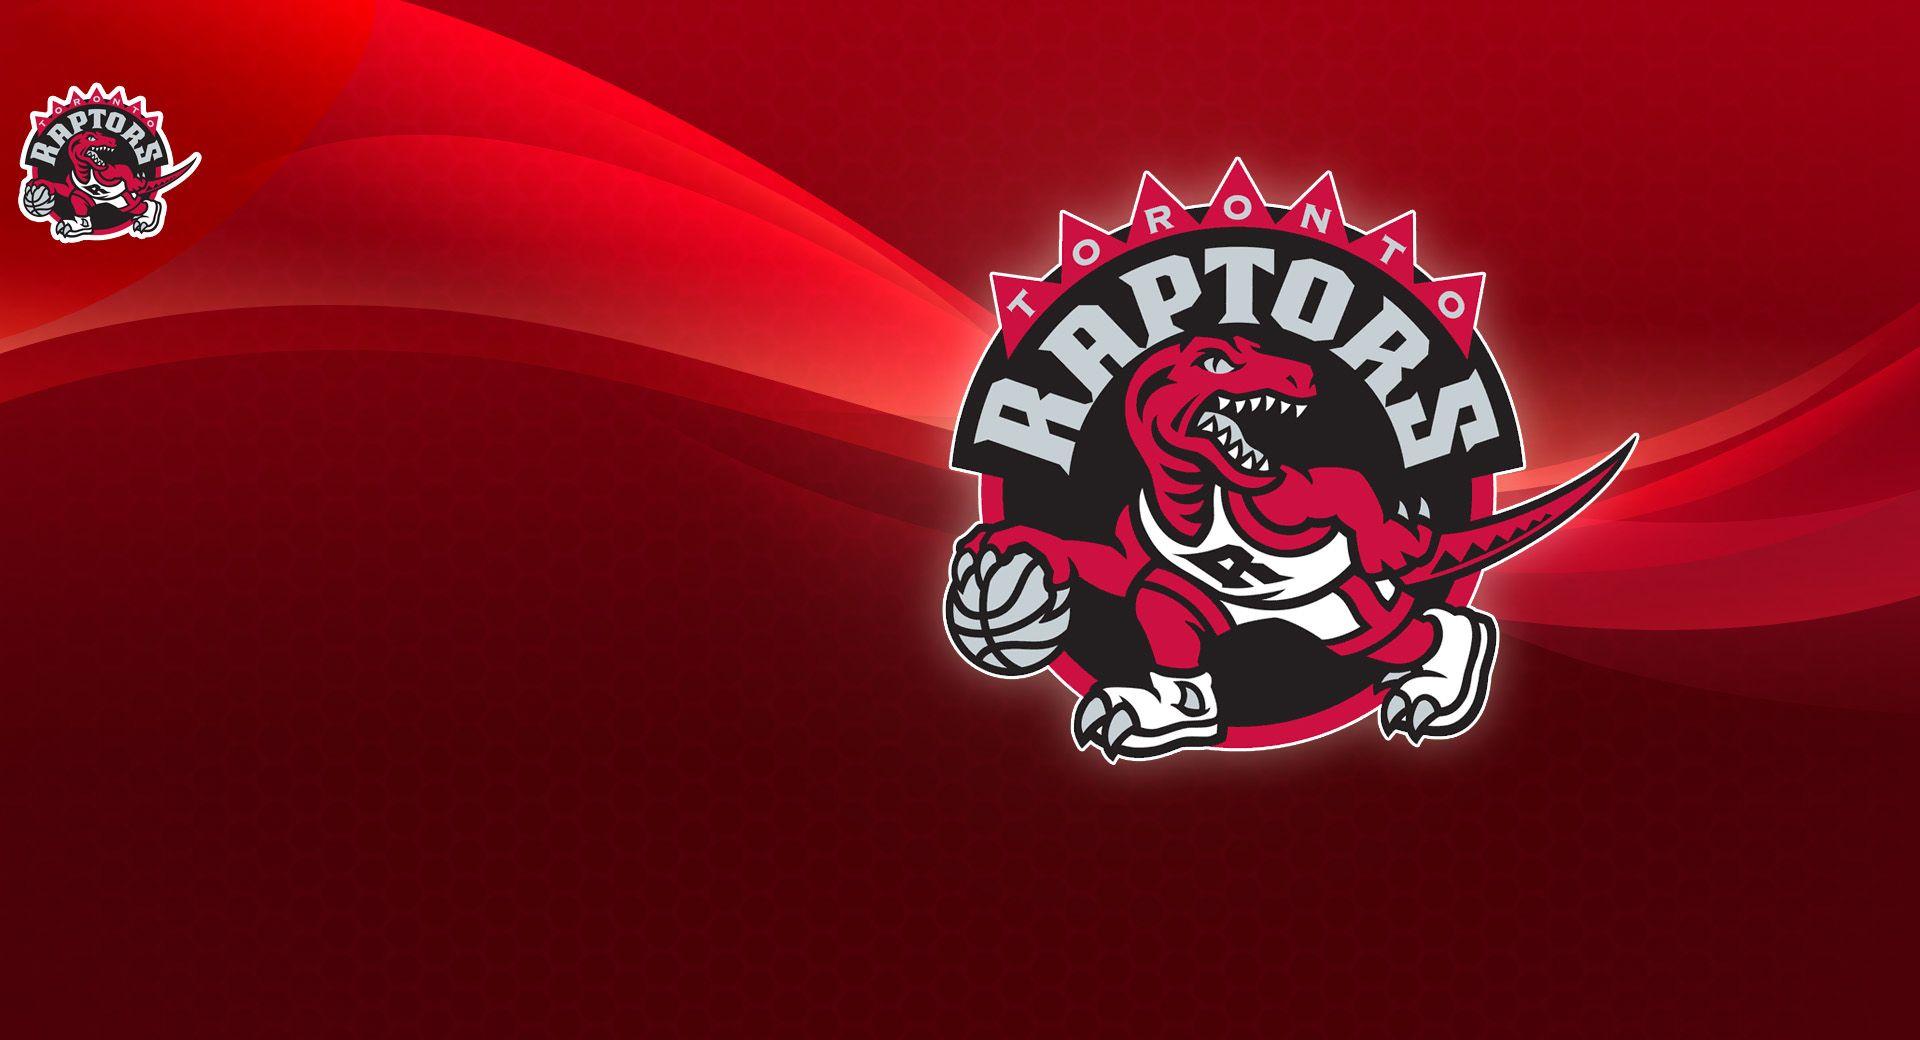 Logo nike wallpaper wallpapersafari - Toronto Raptors Iphone Wallpaper Wallpapersafari